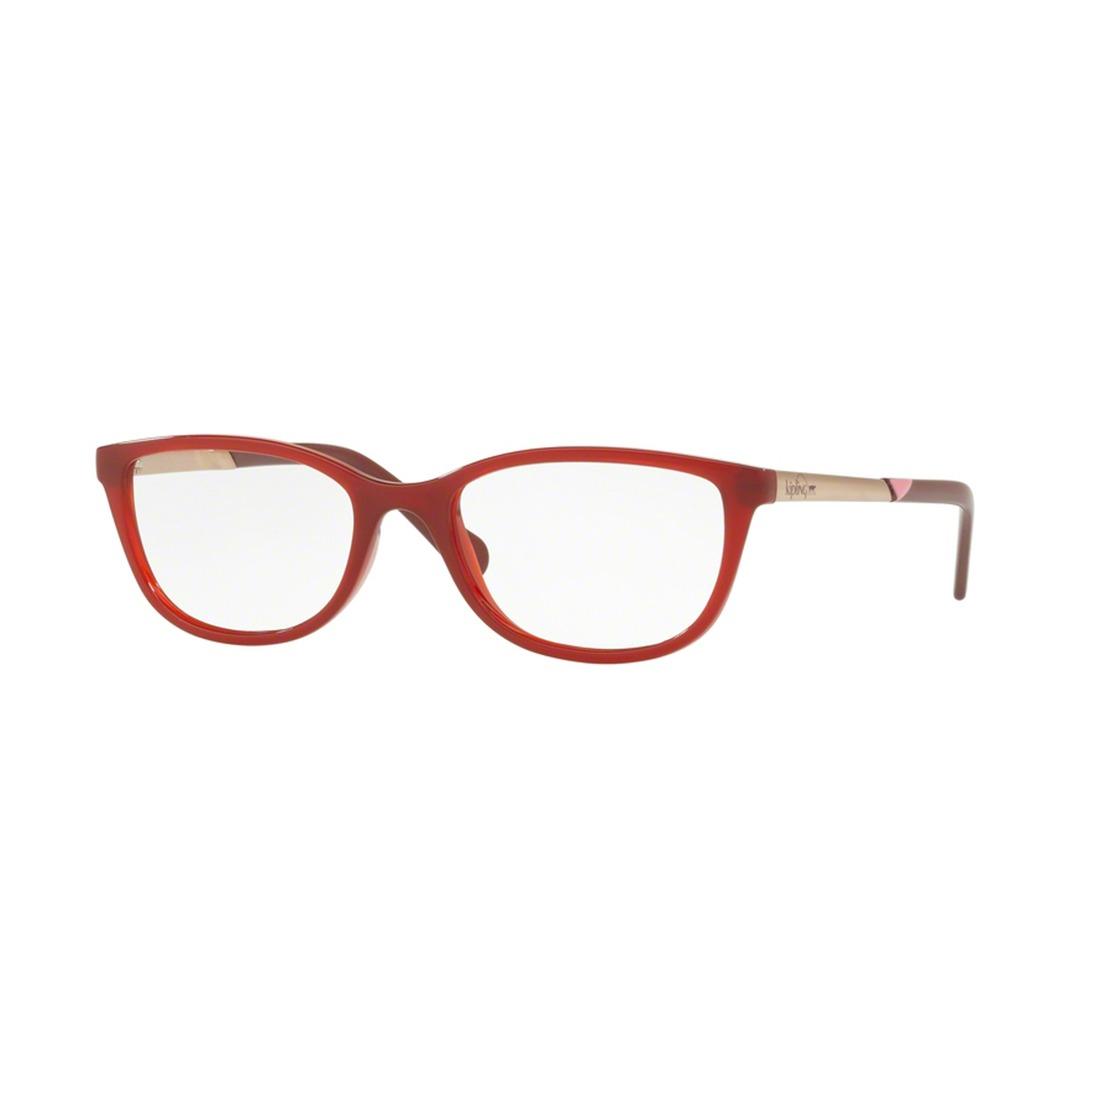 925bdc186 Kipling Kp 3094 Óculos De Grau - R$ 317,60 em Mercado Livre